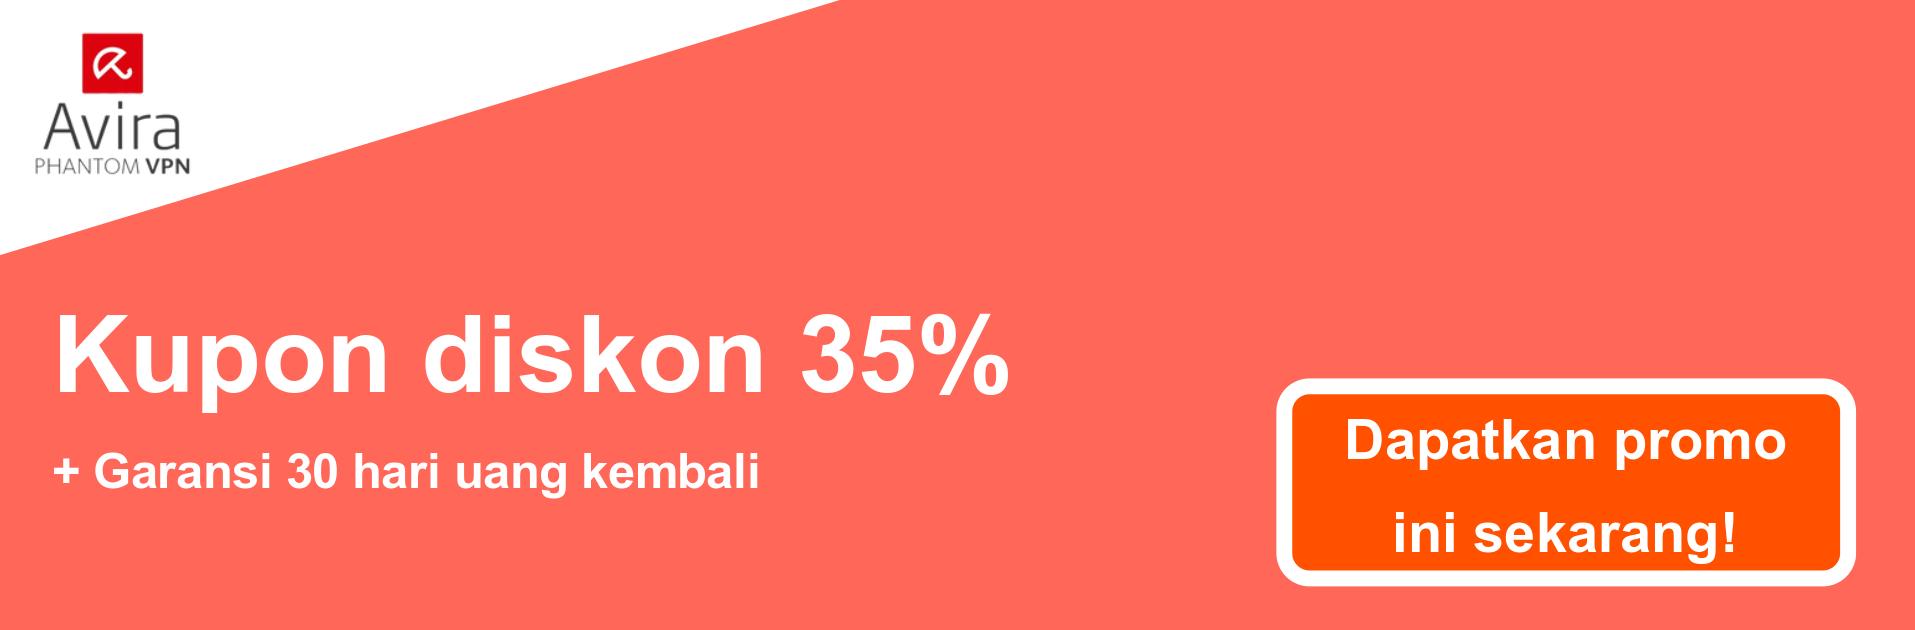 Spanduk kupon AviraVPN - diskon 35%